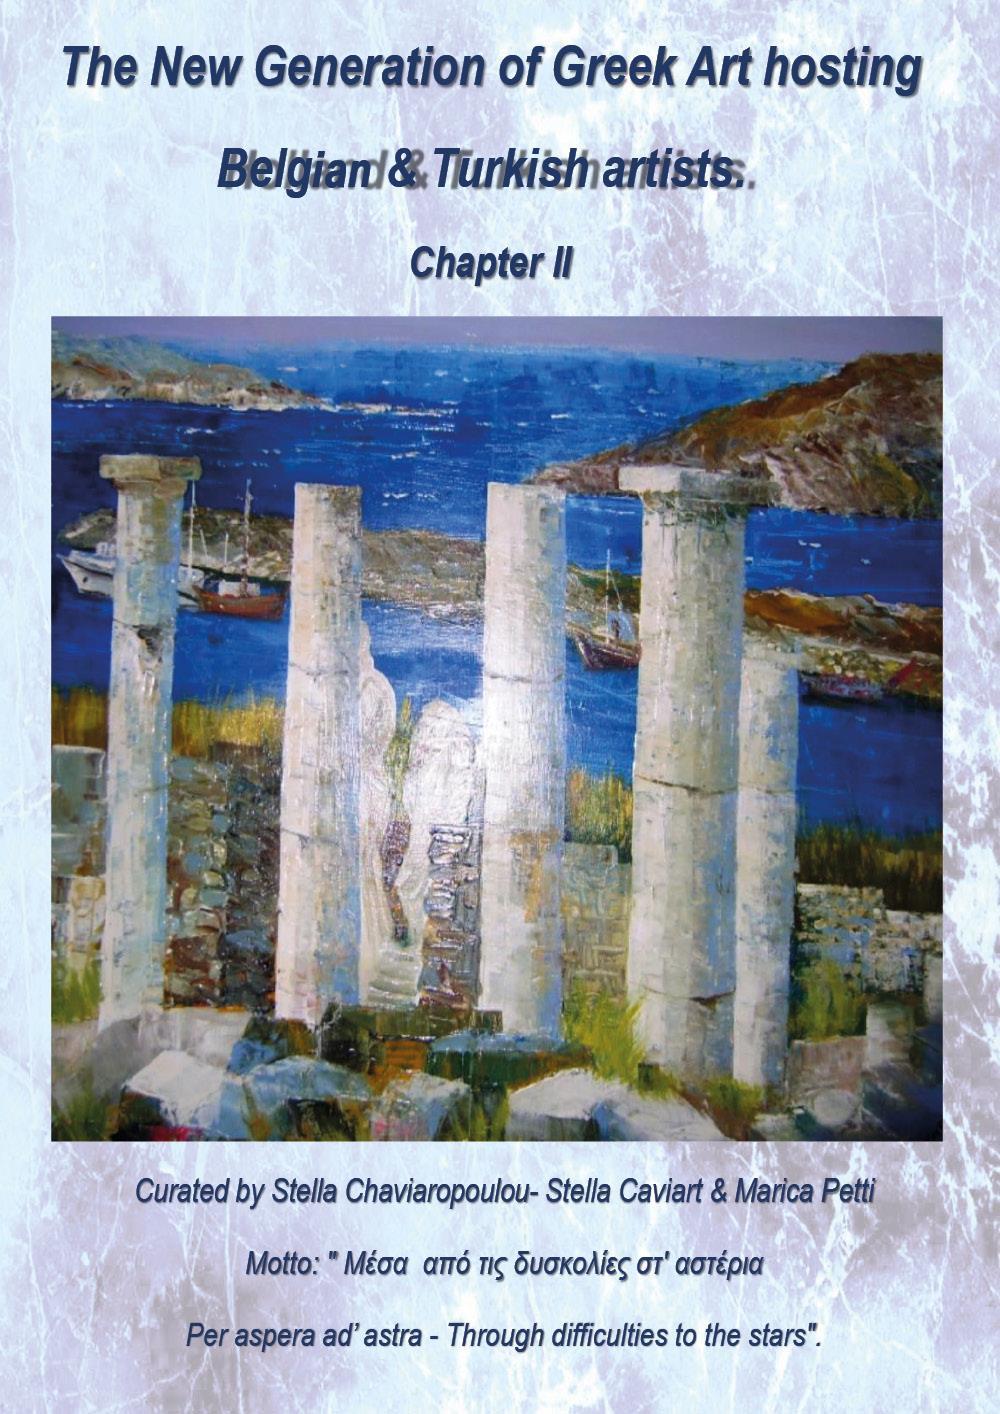 The New Generation of Greek Art hosting Belgian & Turkish artists. Chapter II